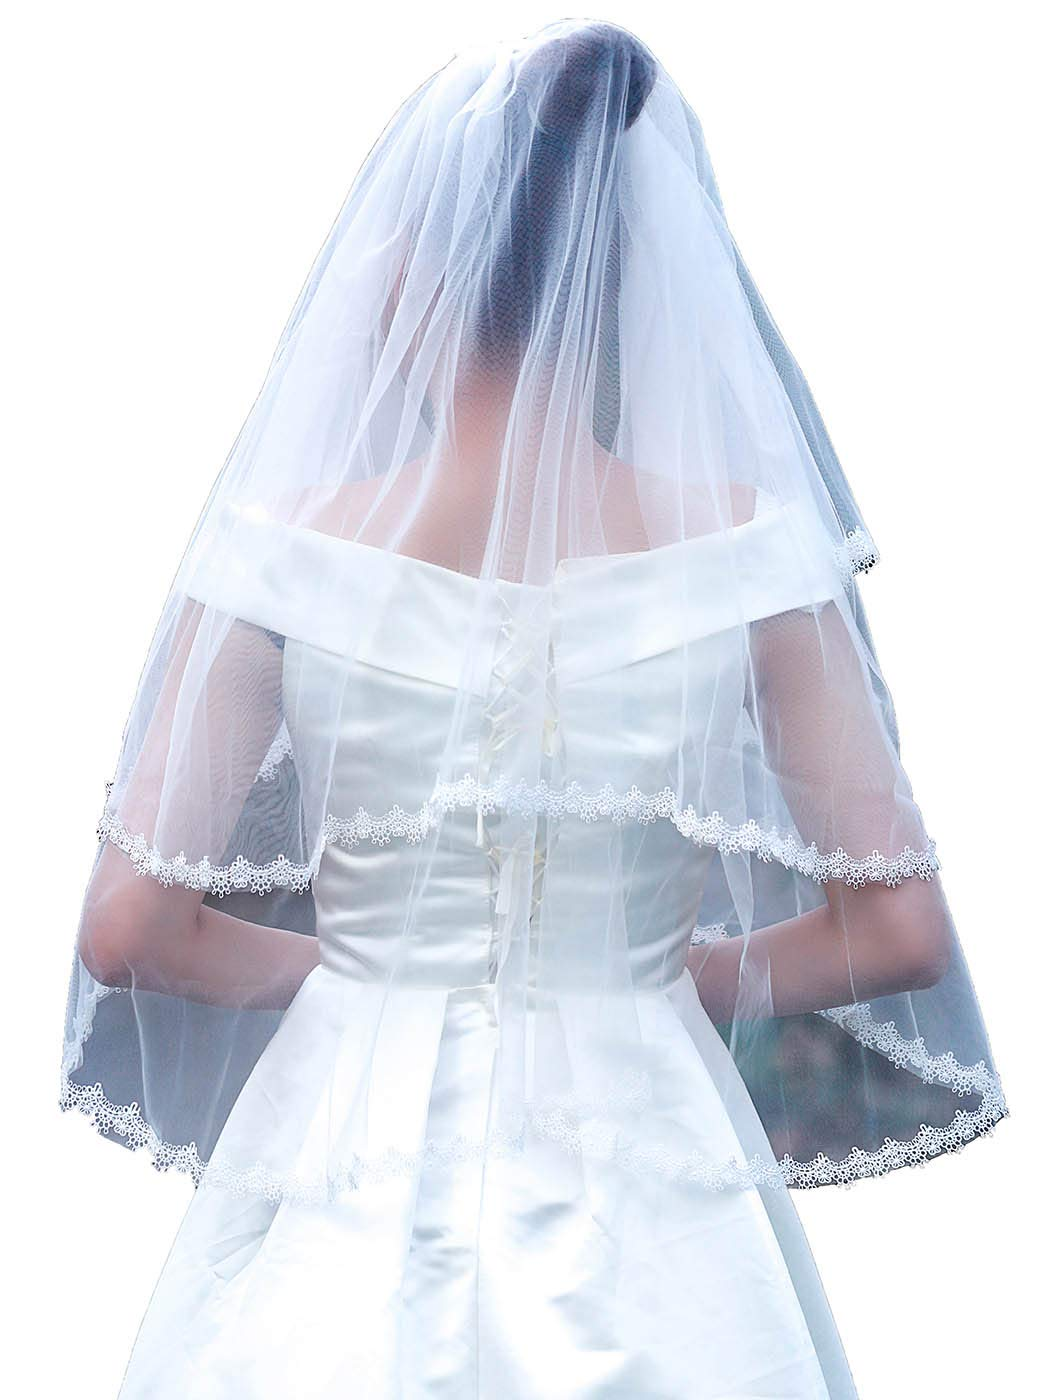 Yokawe Women's Wedding Bridal Veil 2 Tier Lace Applique Edge Bride Veils with Comb Fingertip Length Wedding Headpiece (White)